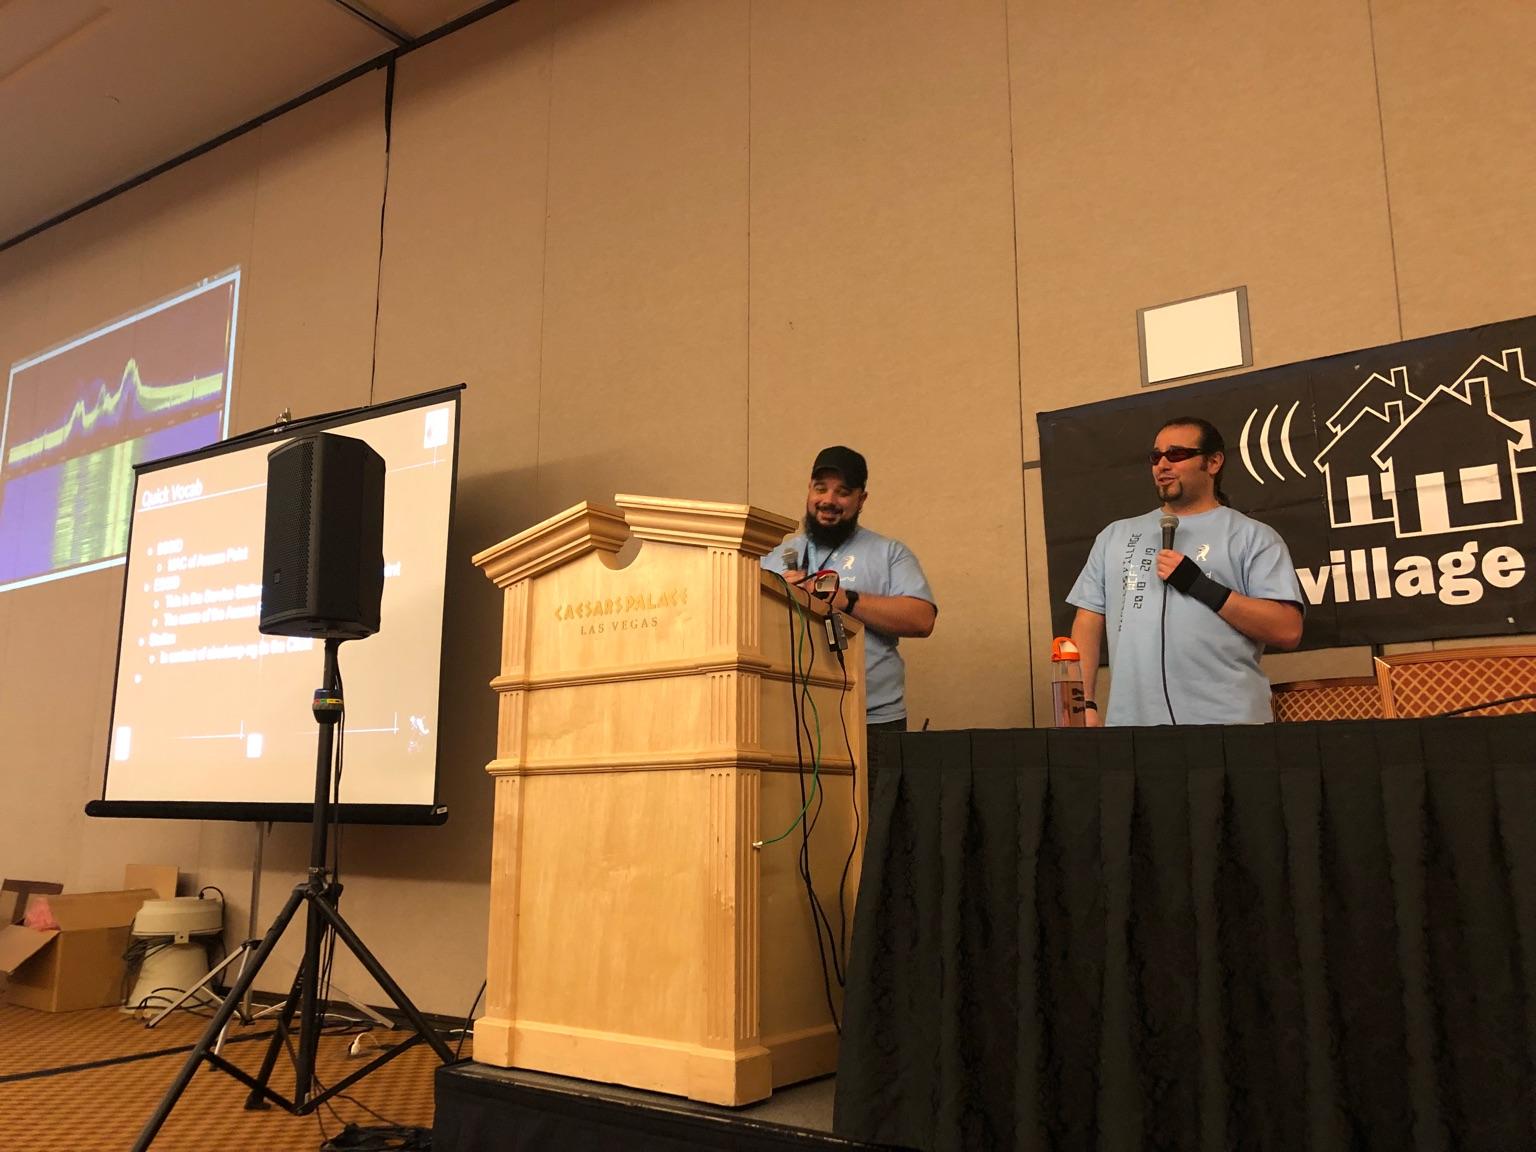 Zero and Wasabi at the podium